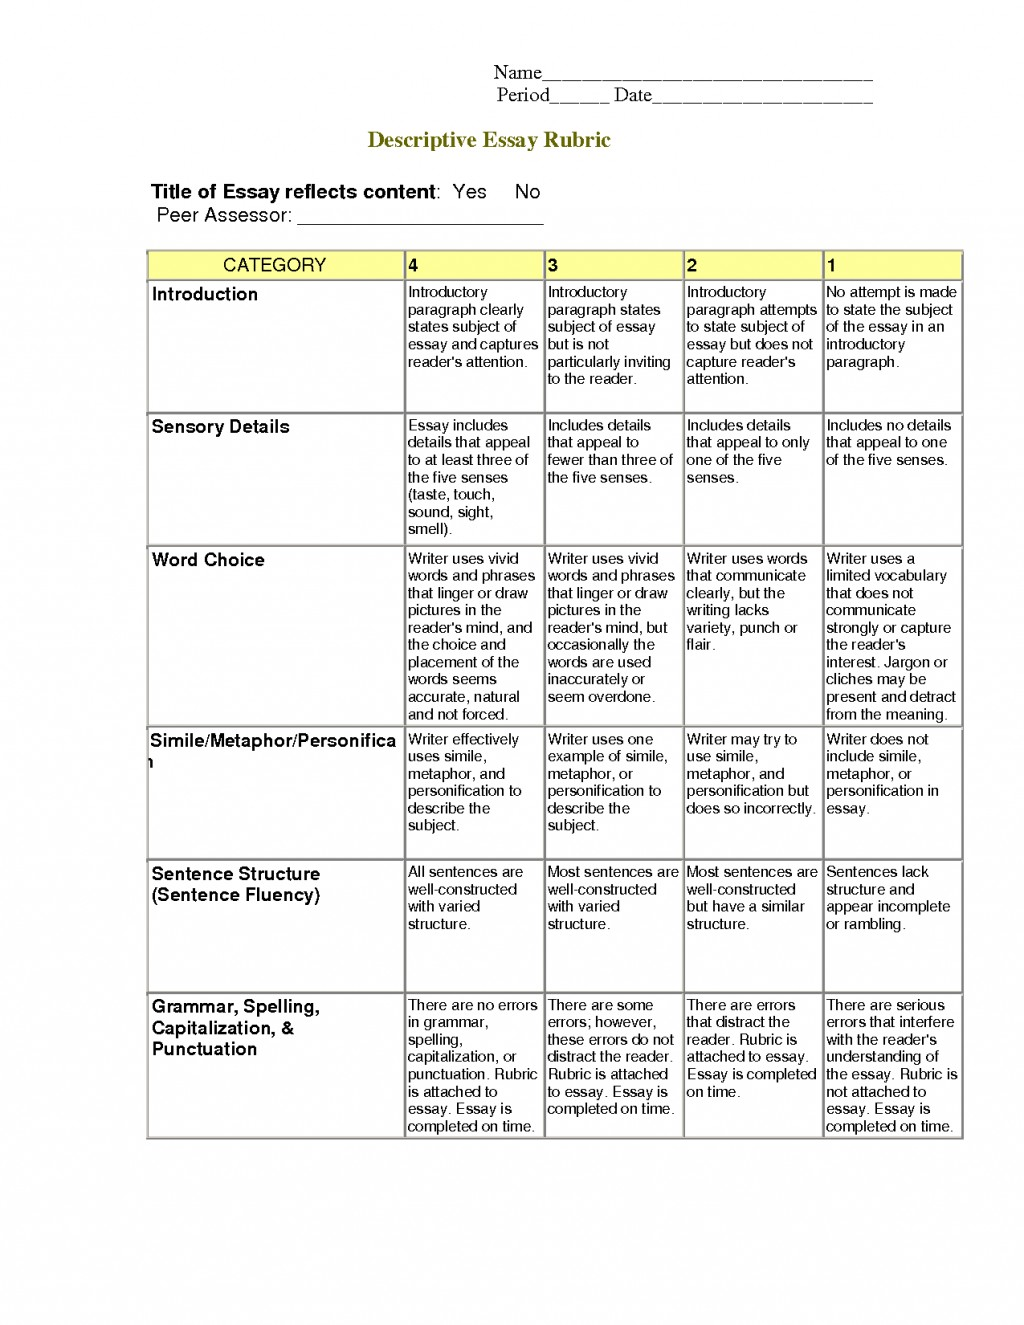 002 Rubrics In Essay Writing Formidable Holistic For Pdf Rubric Middle School Large